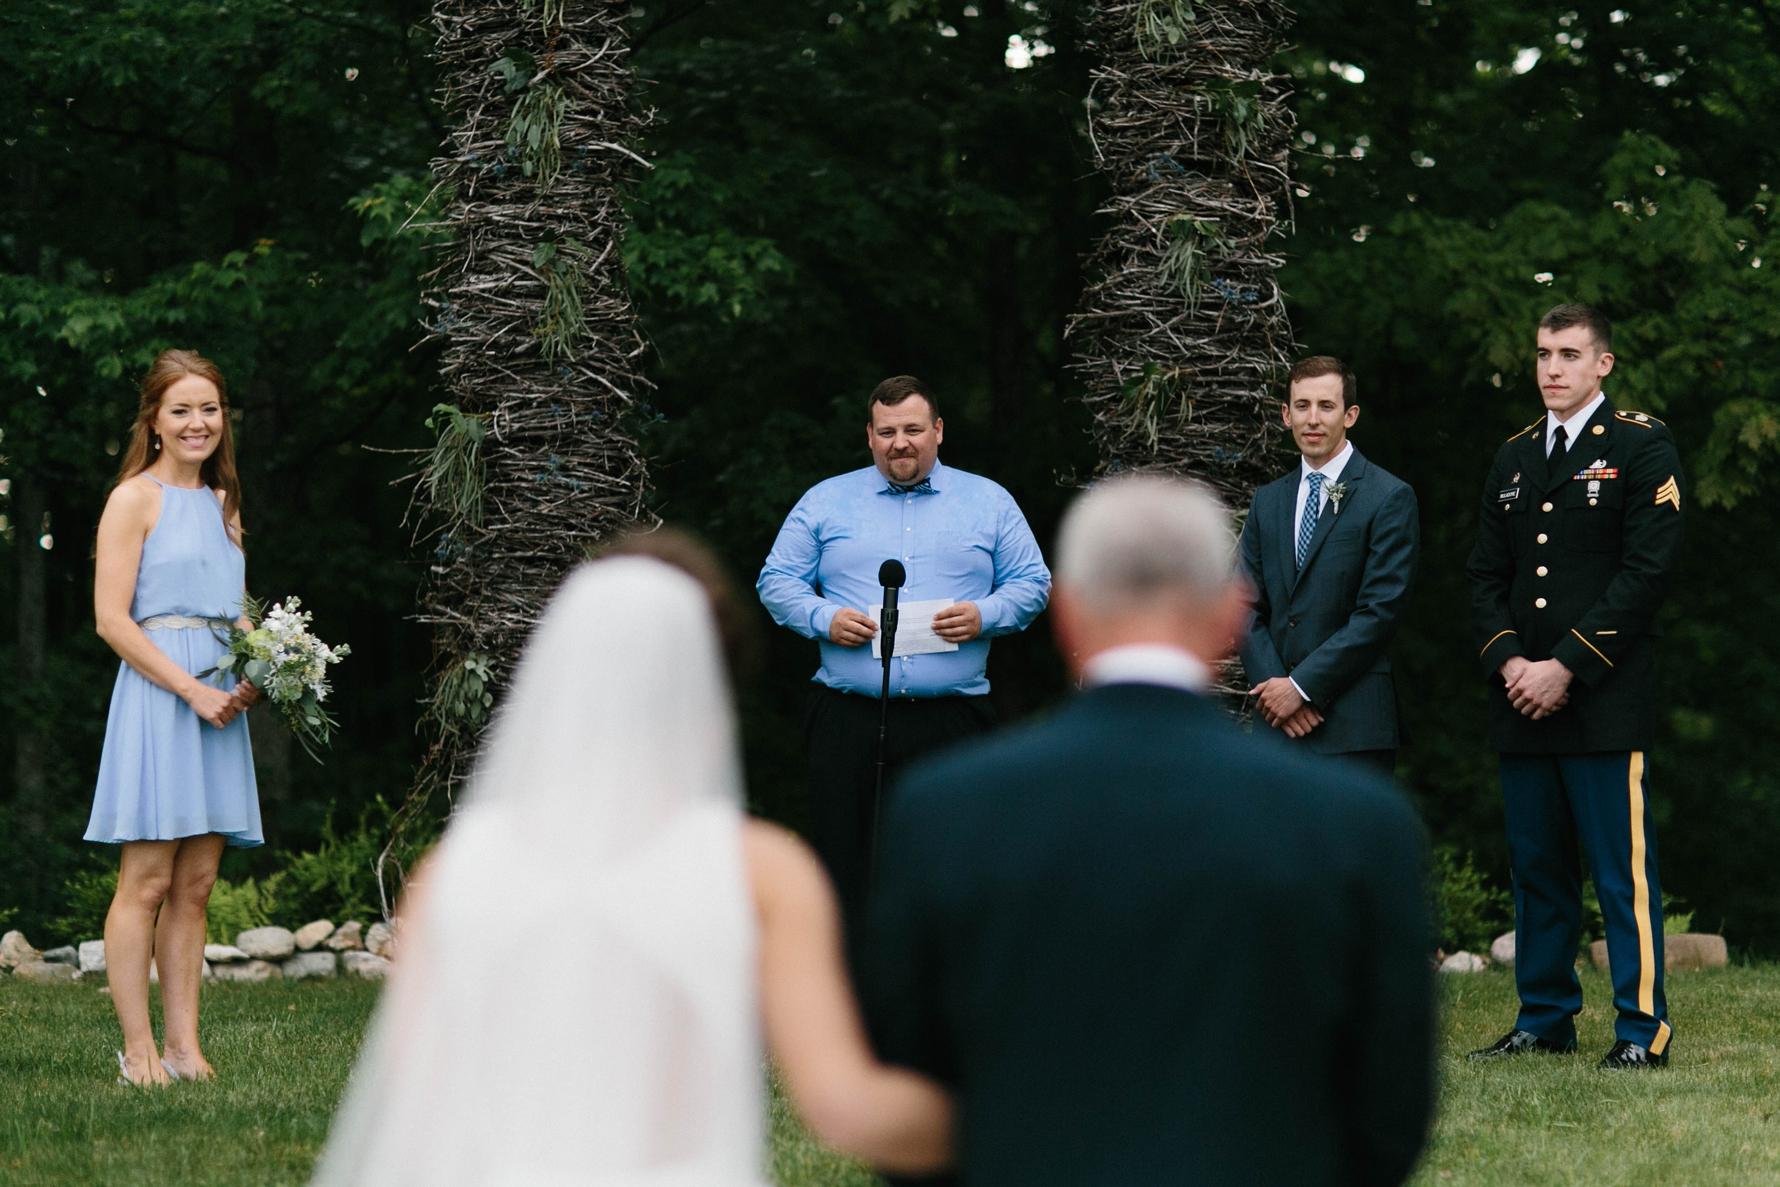 Anderson Wedding 045.JPG